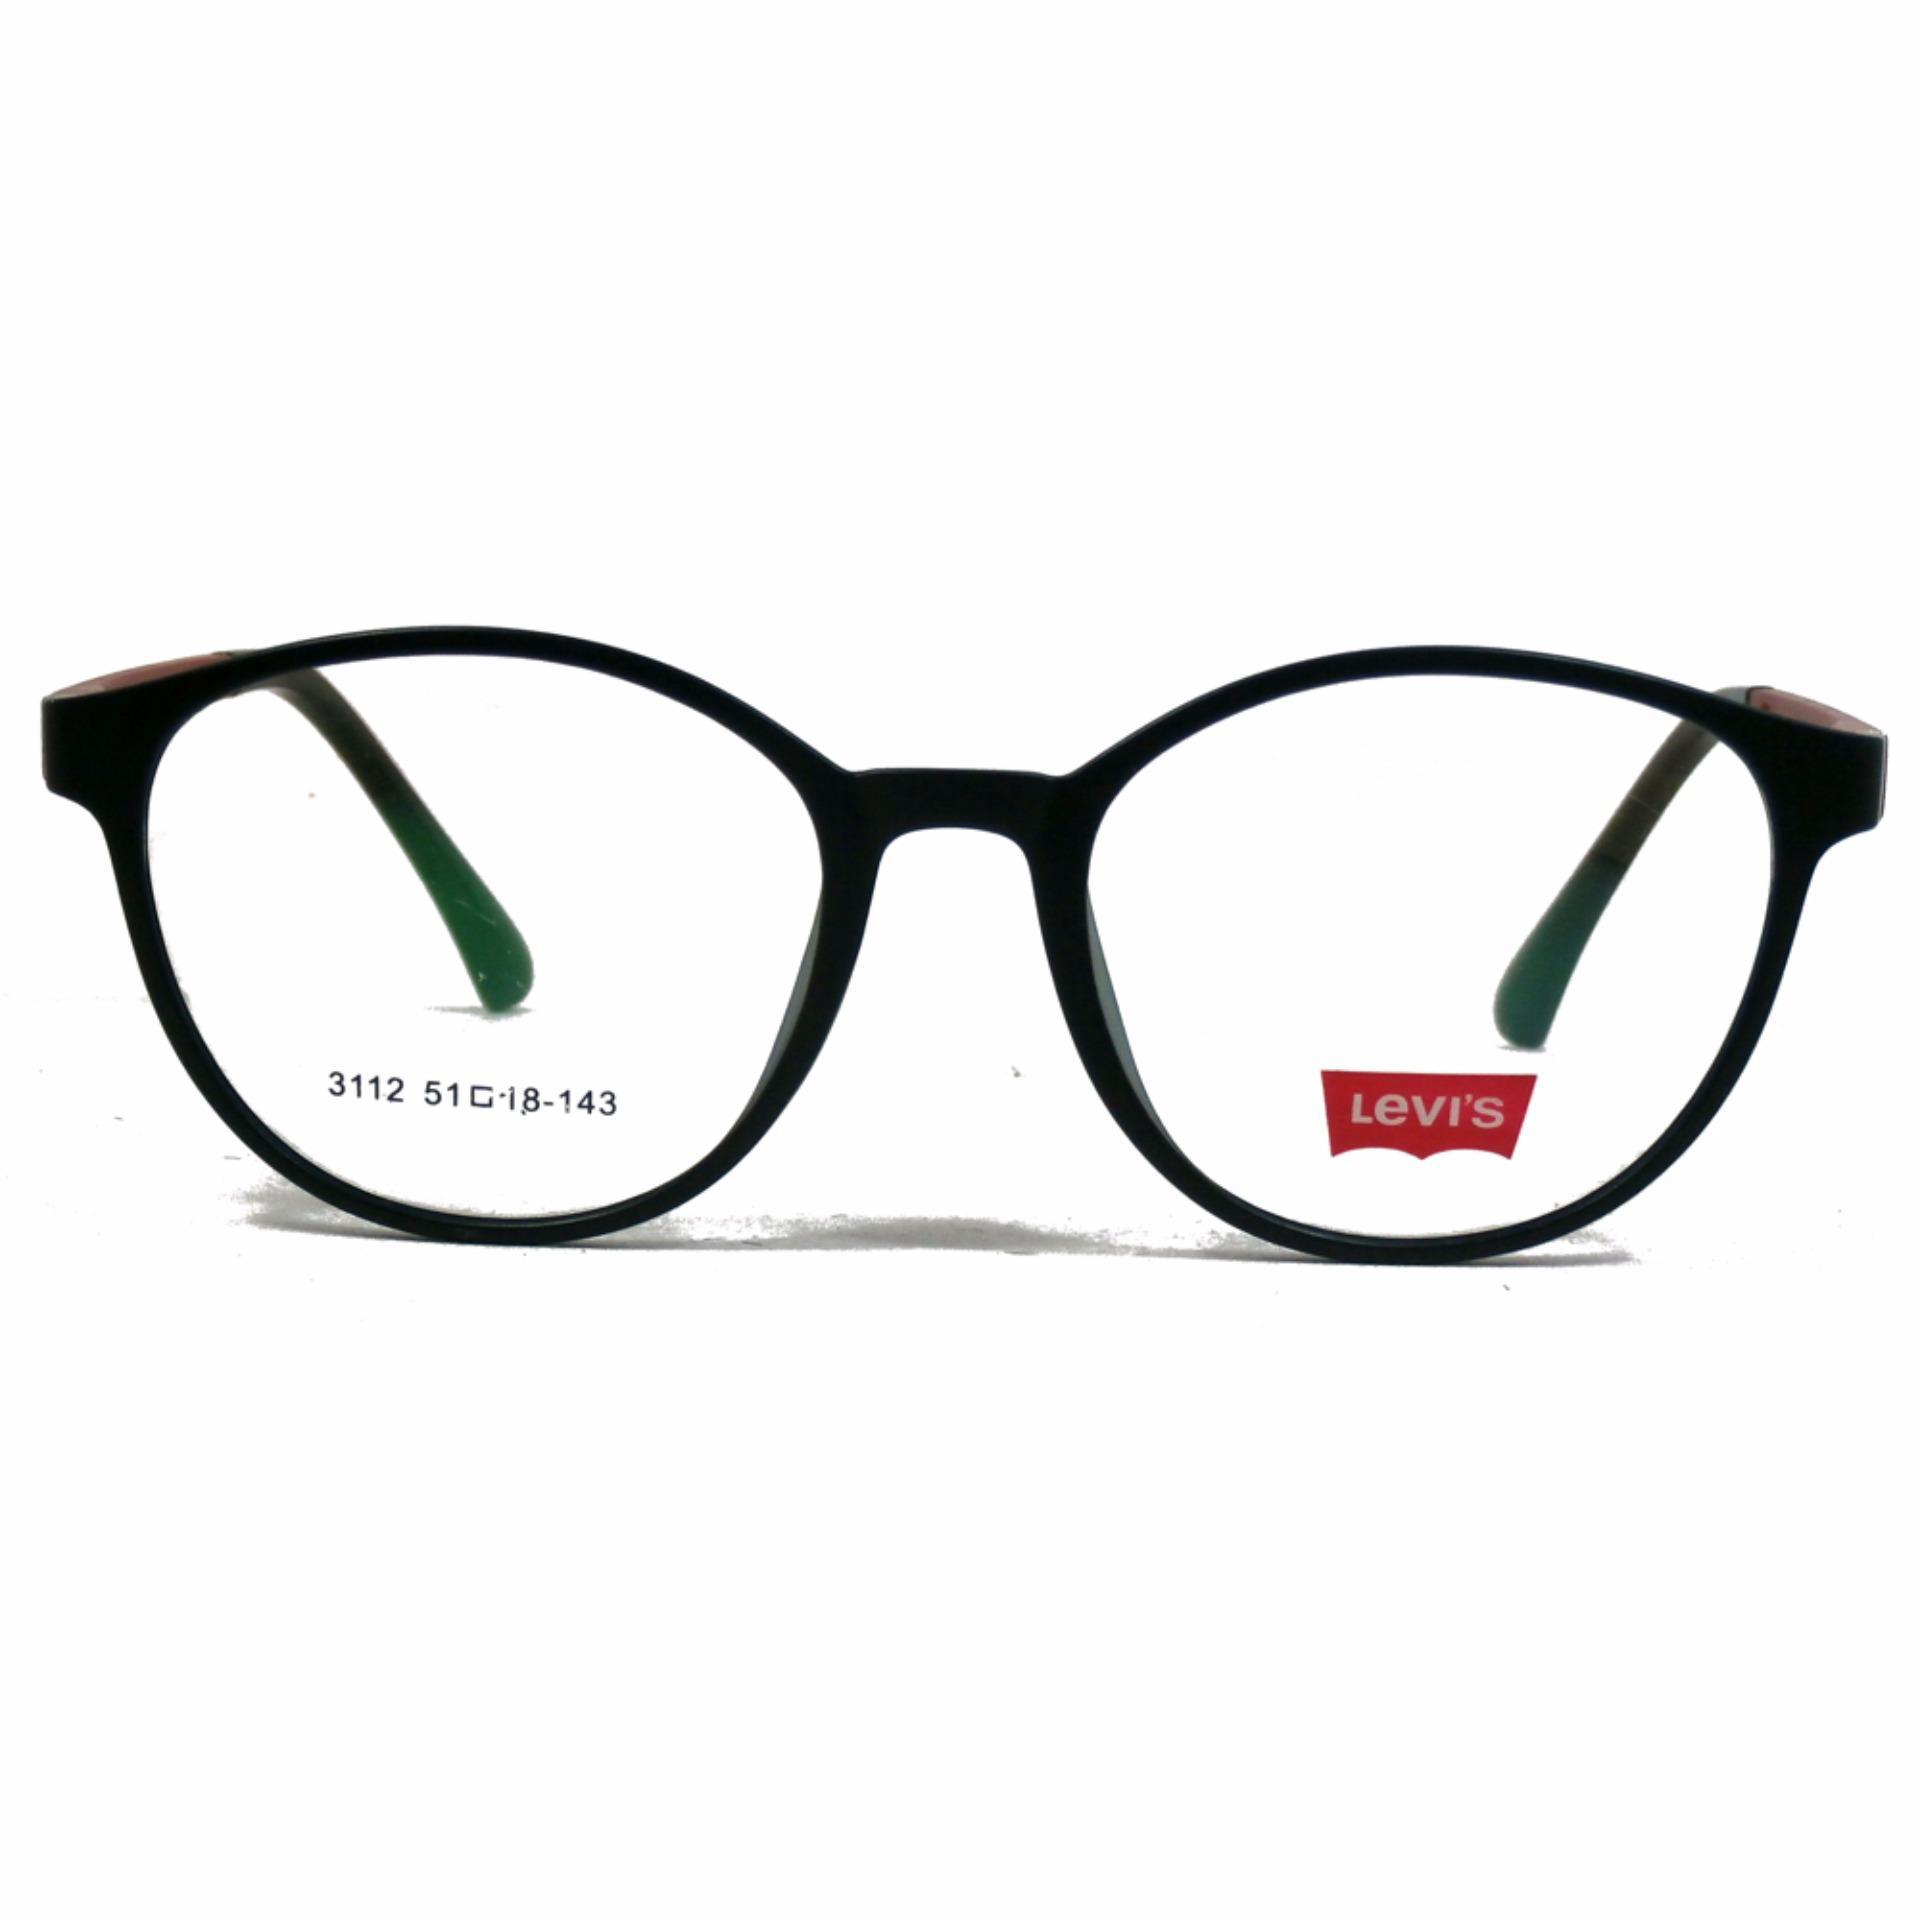 Frame Kacamata Wanita Bulat Levis 3112 Hitam Bisa Dipasang Lensa Minus Di Optik .